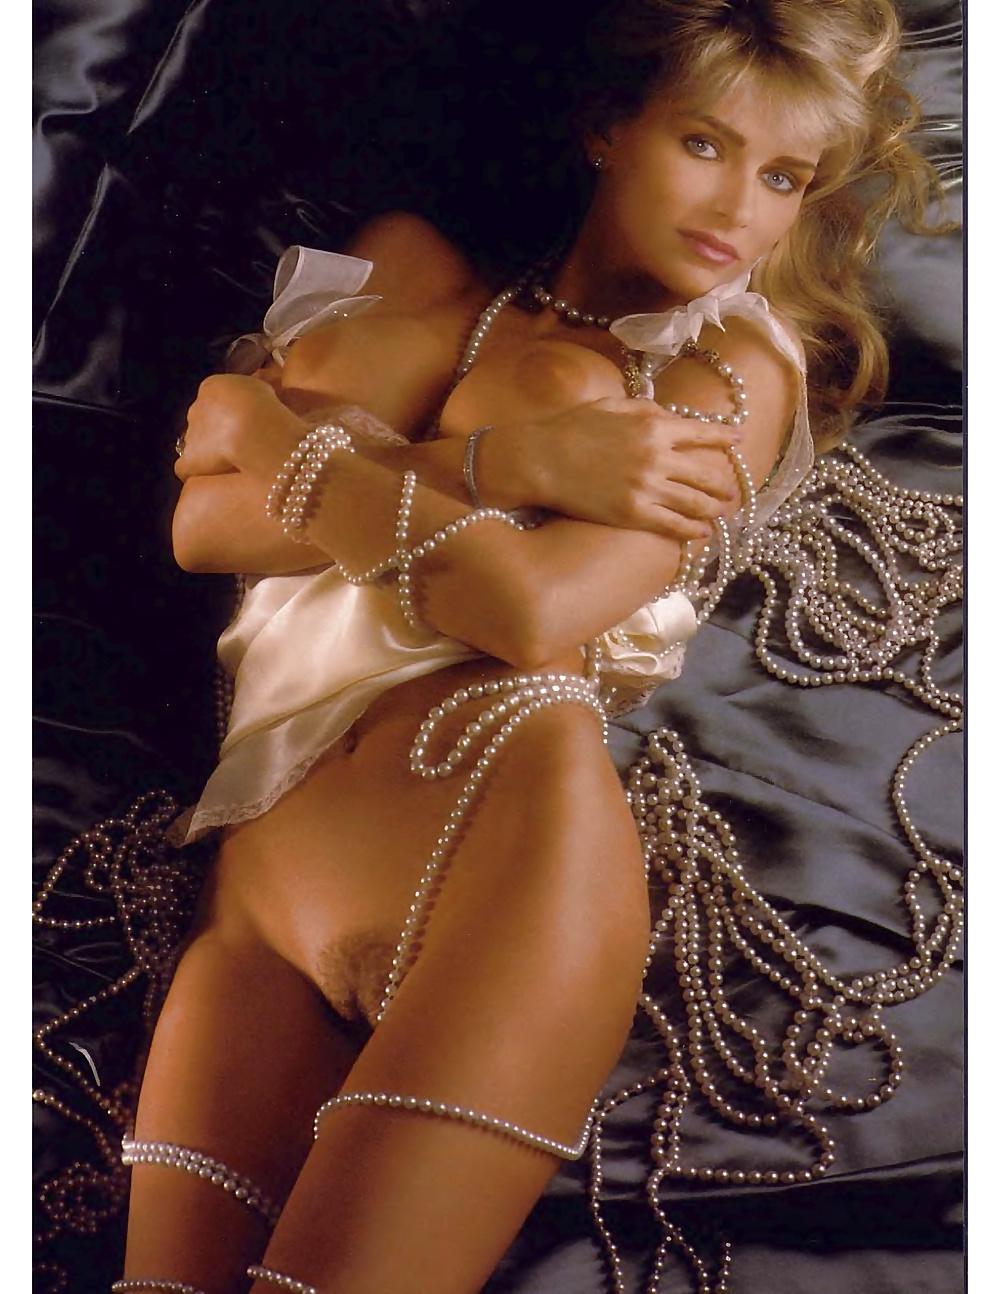 Kimberly corona nude, yahoo answer anal sex